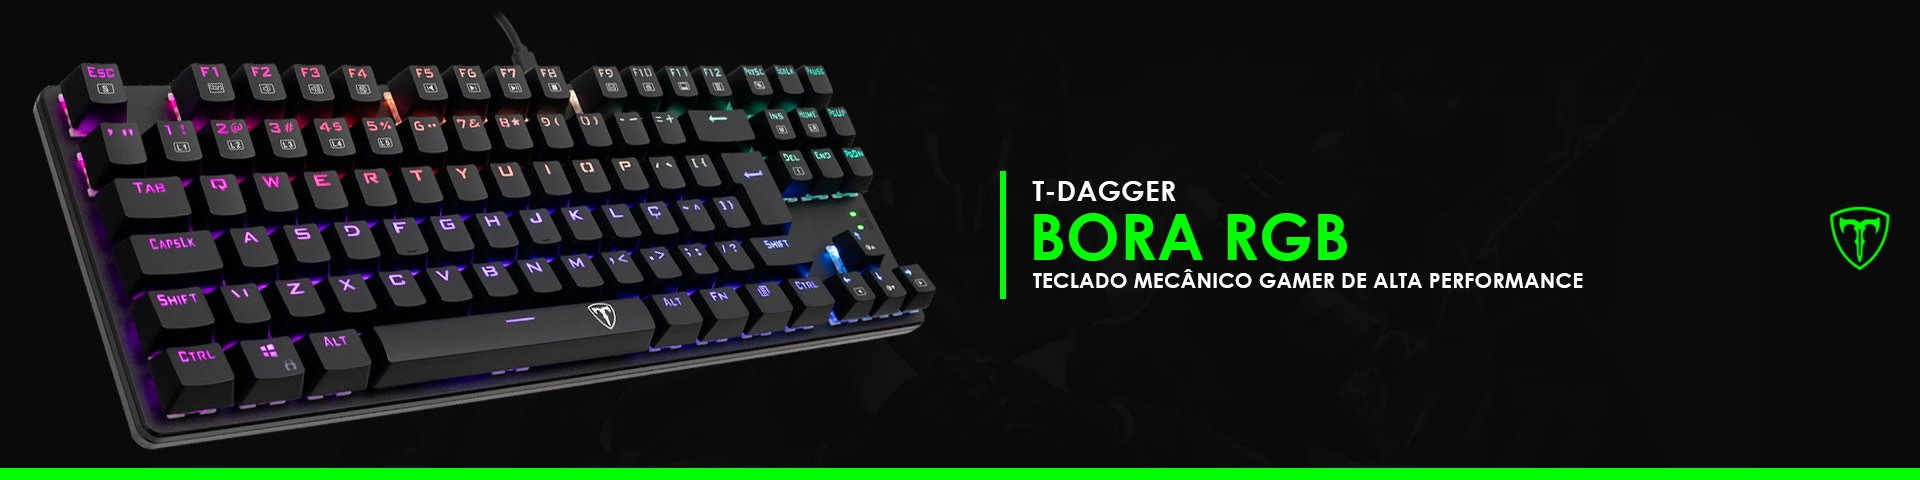 Domine com o T-Dagger Bora RGB